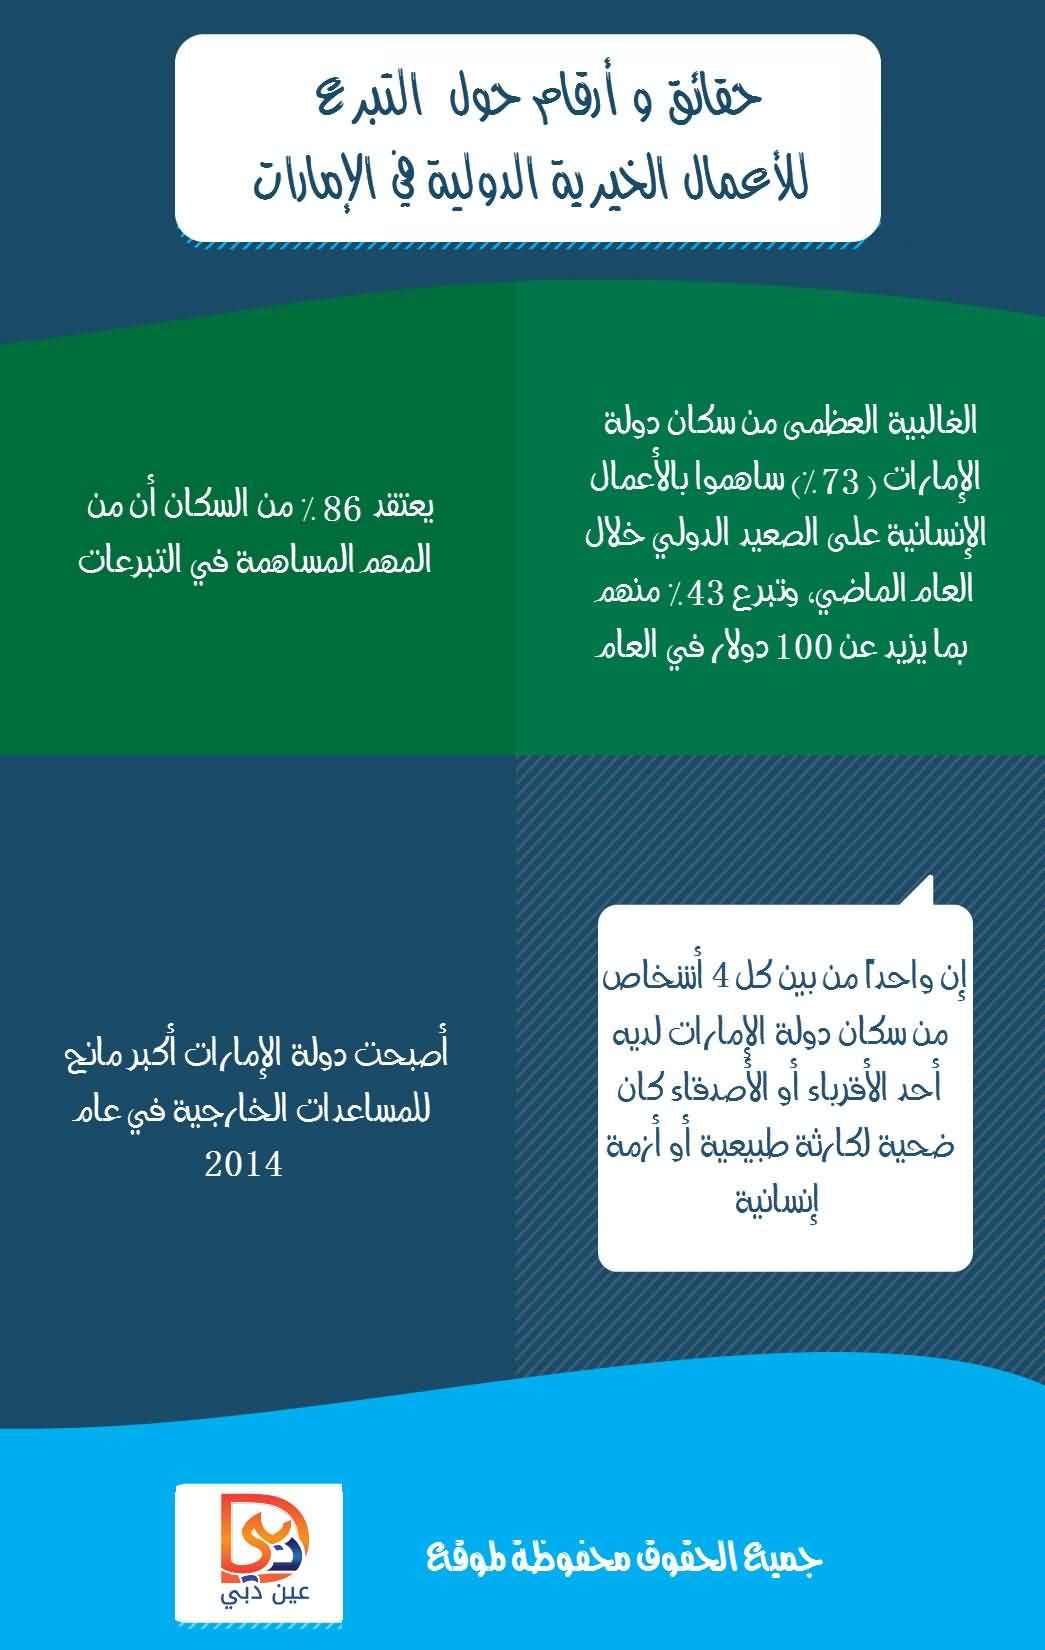 IAEE_CEM-Salary-Infographic